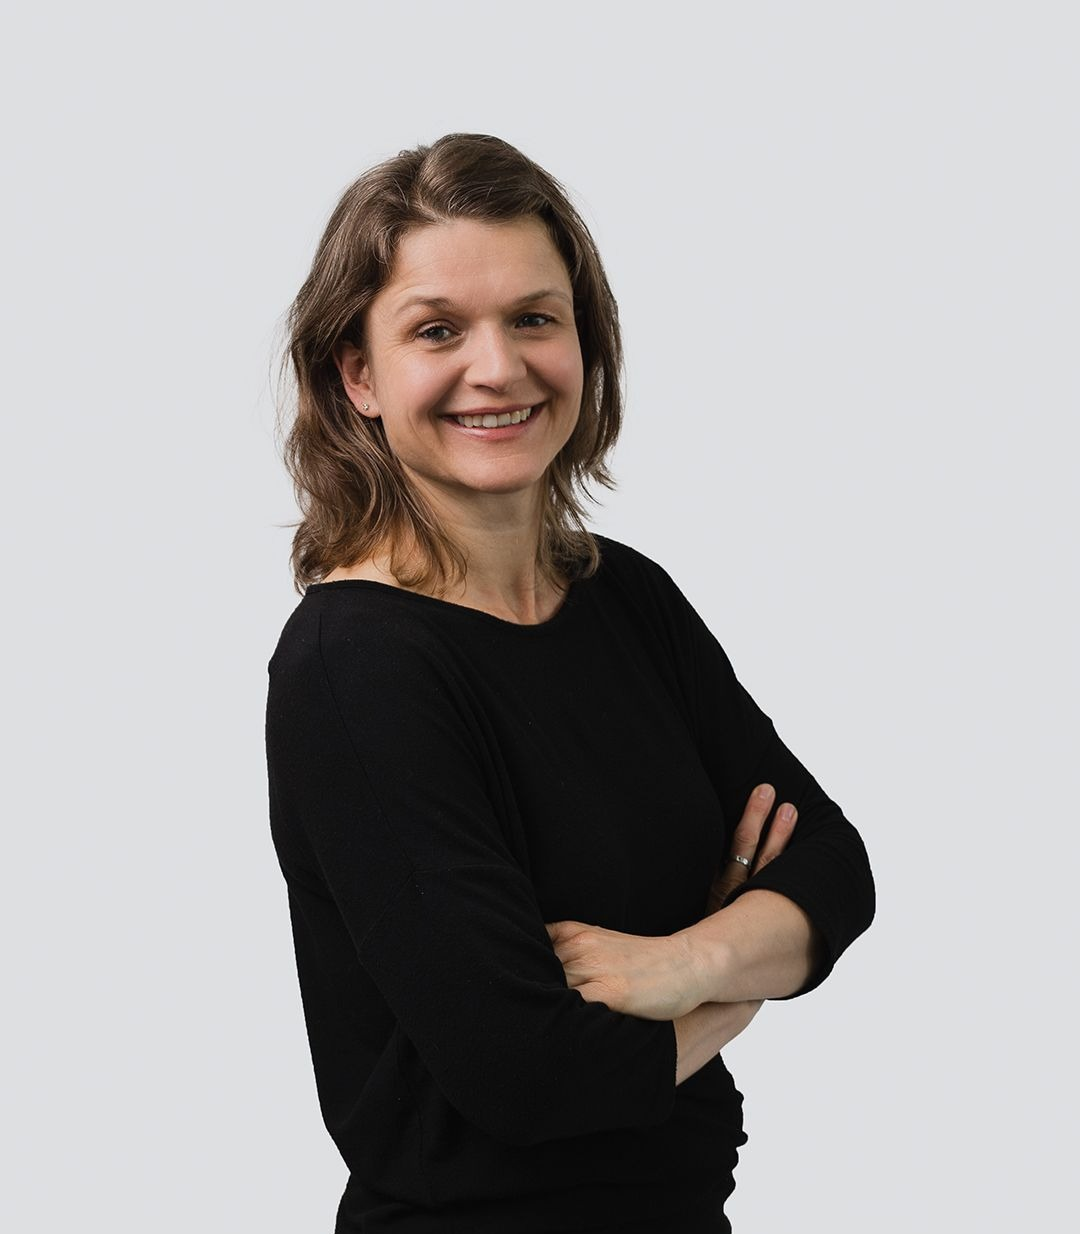 Simone Lisa Bobst